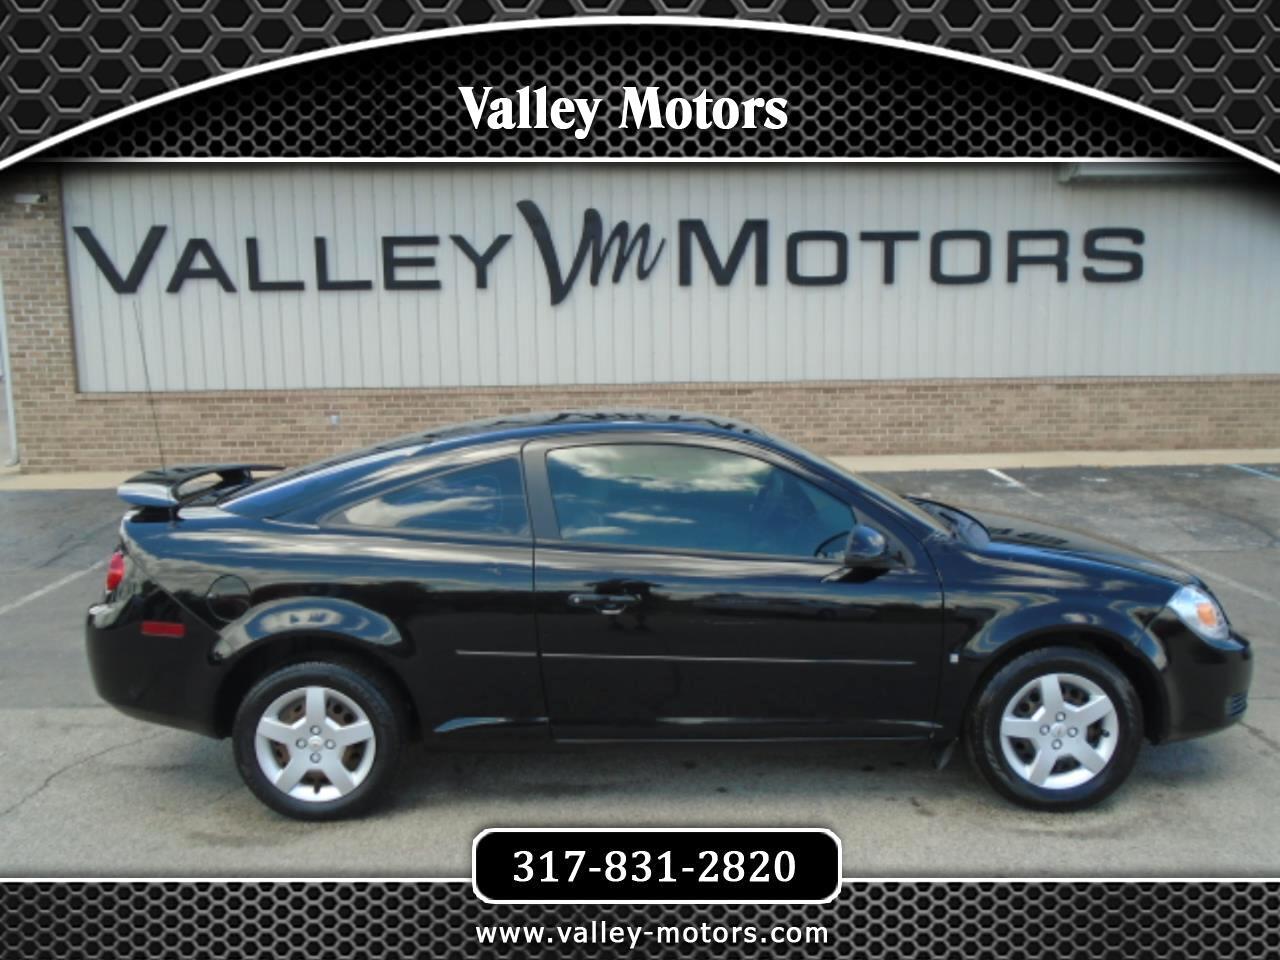 Chevrolet Cobalt 2dr Cpe LT 2007